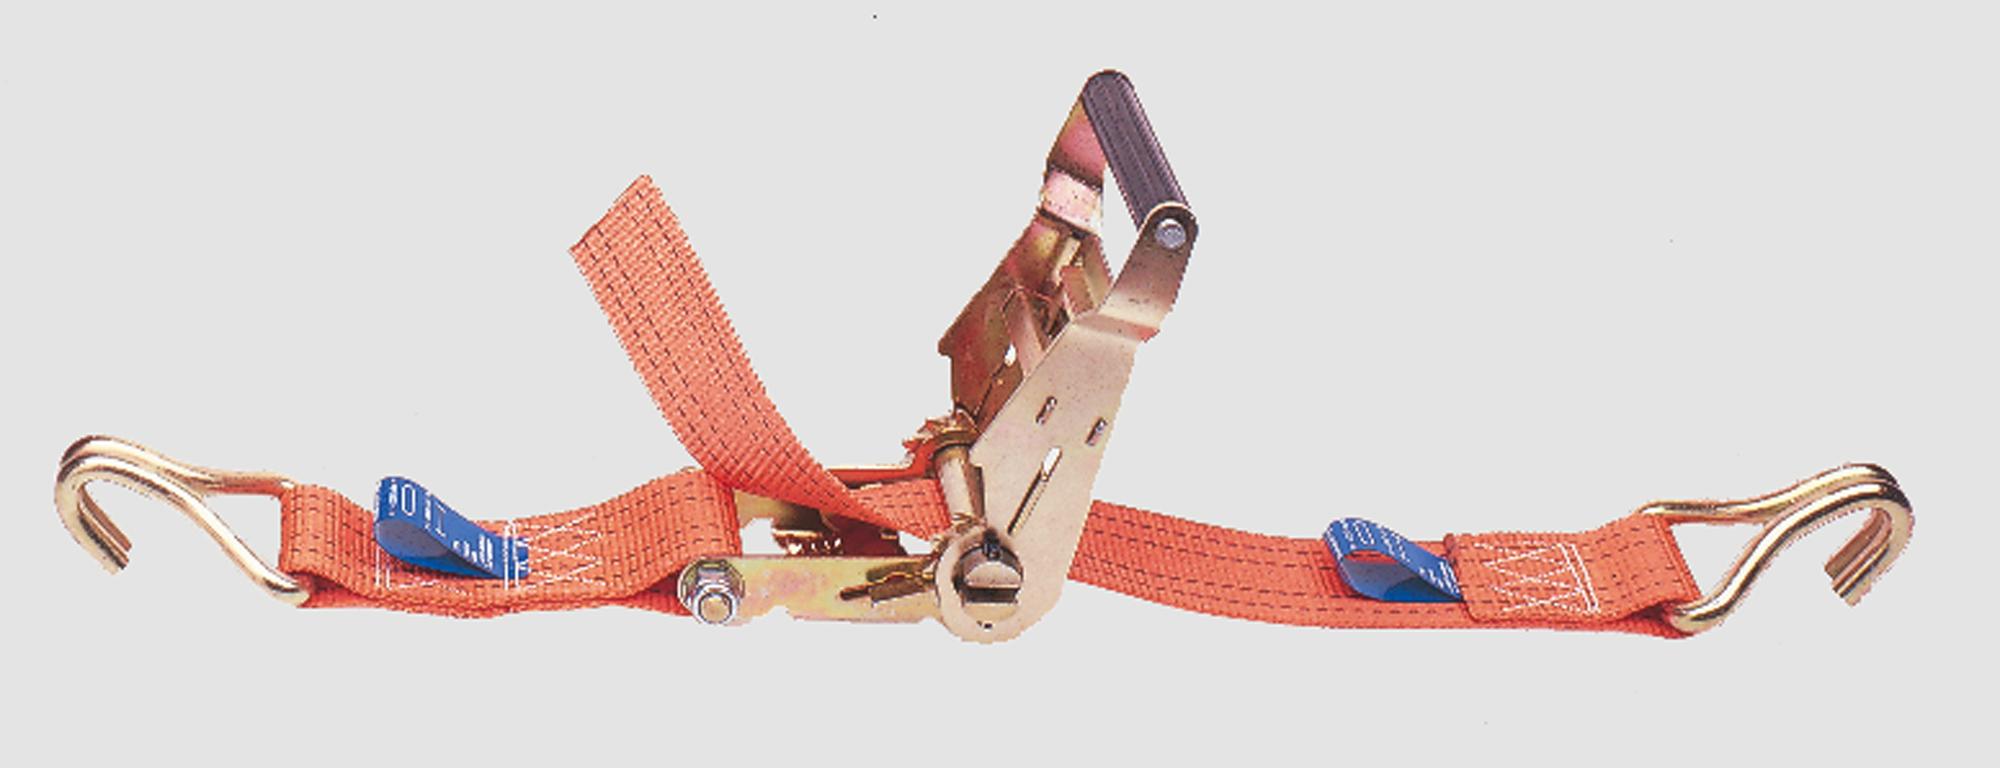 Huck Gurtbandnetze 2000